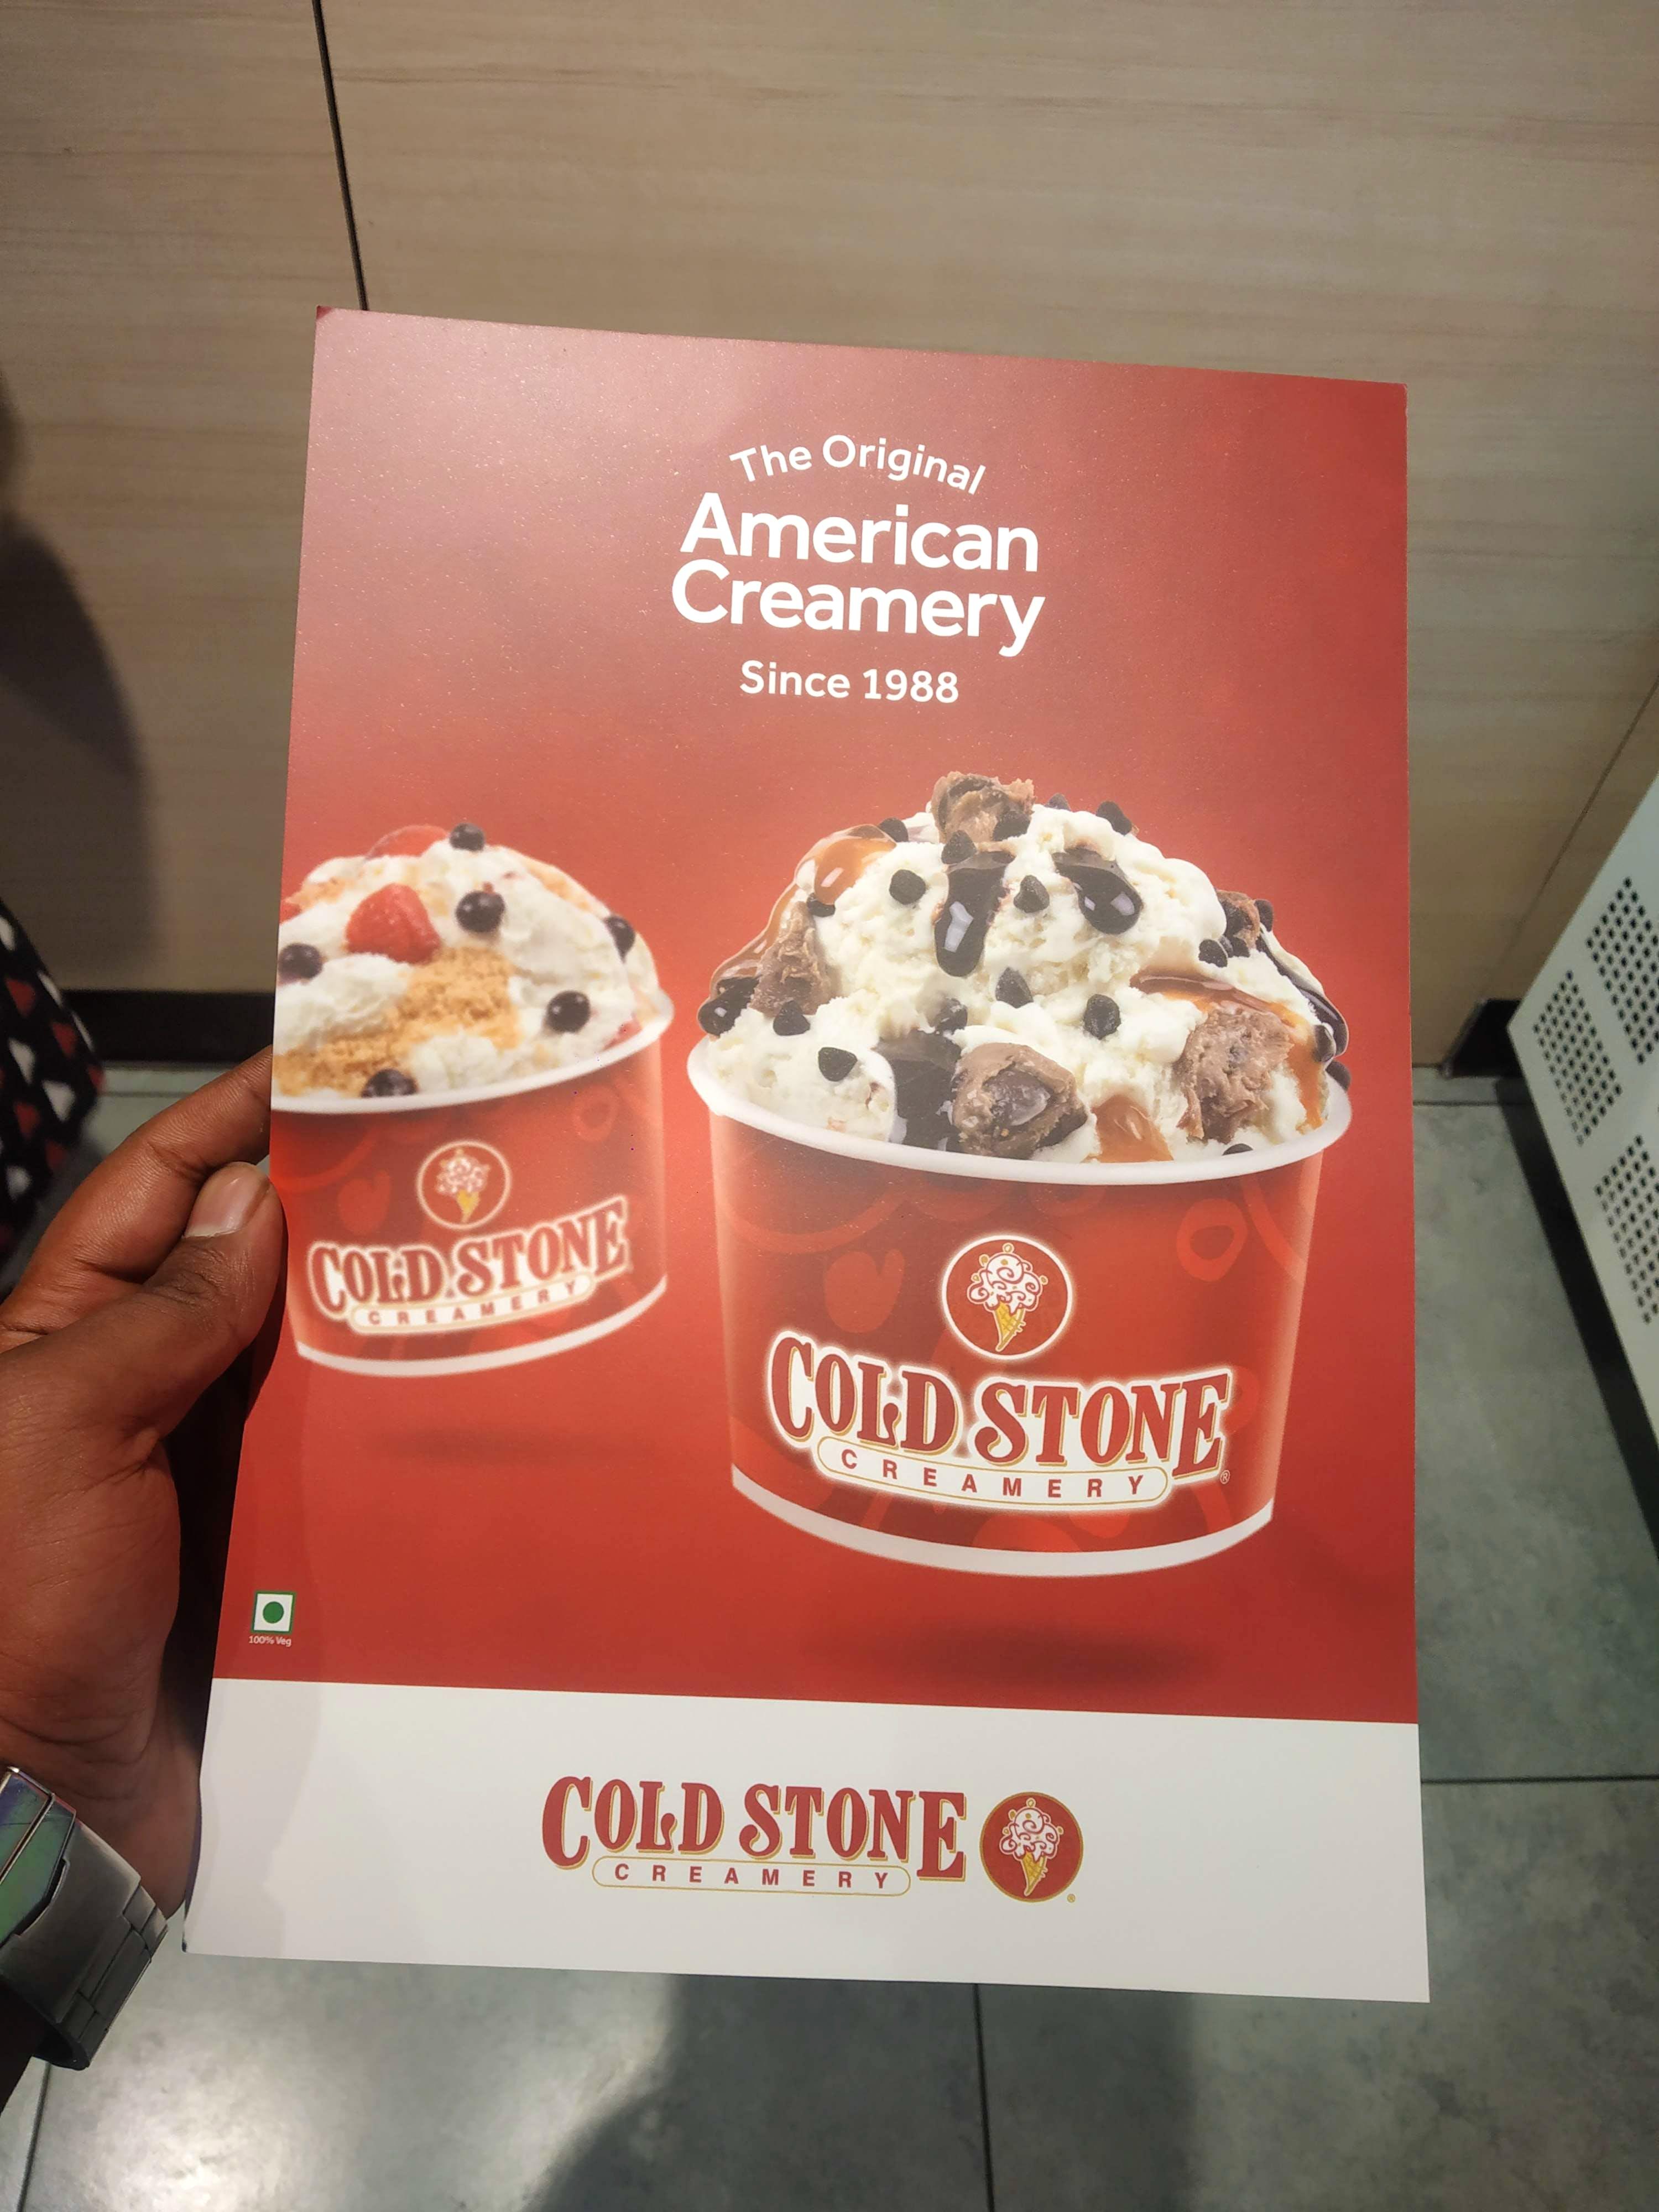 image - Cold Stone Creamery